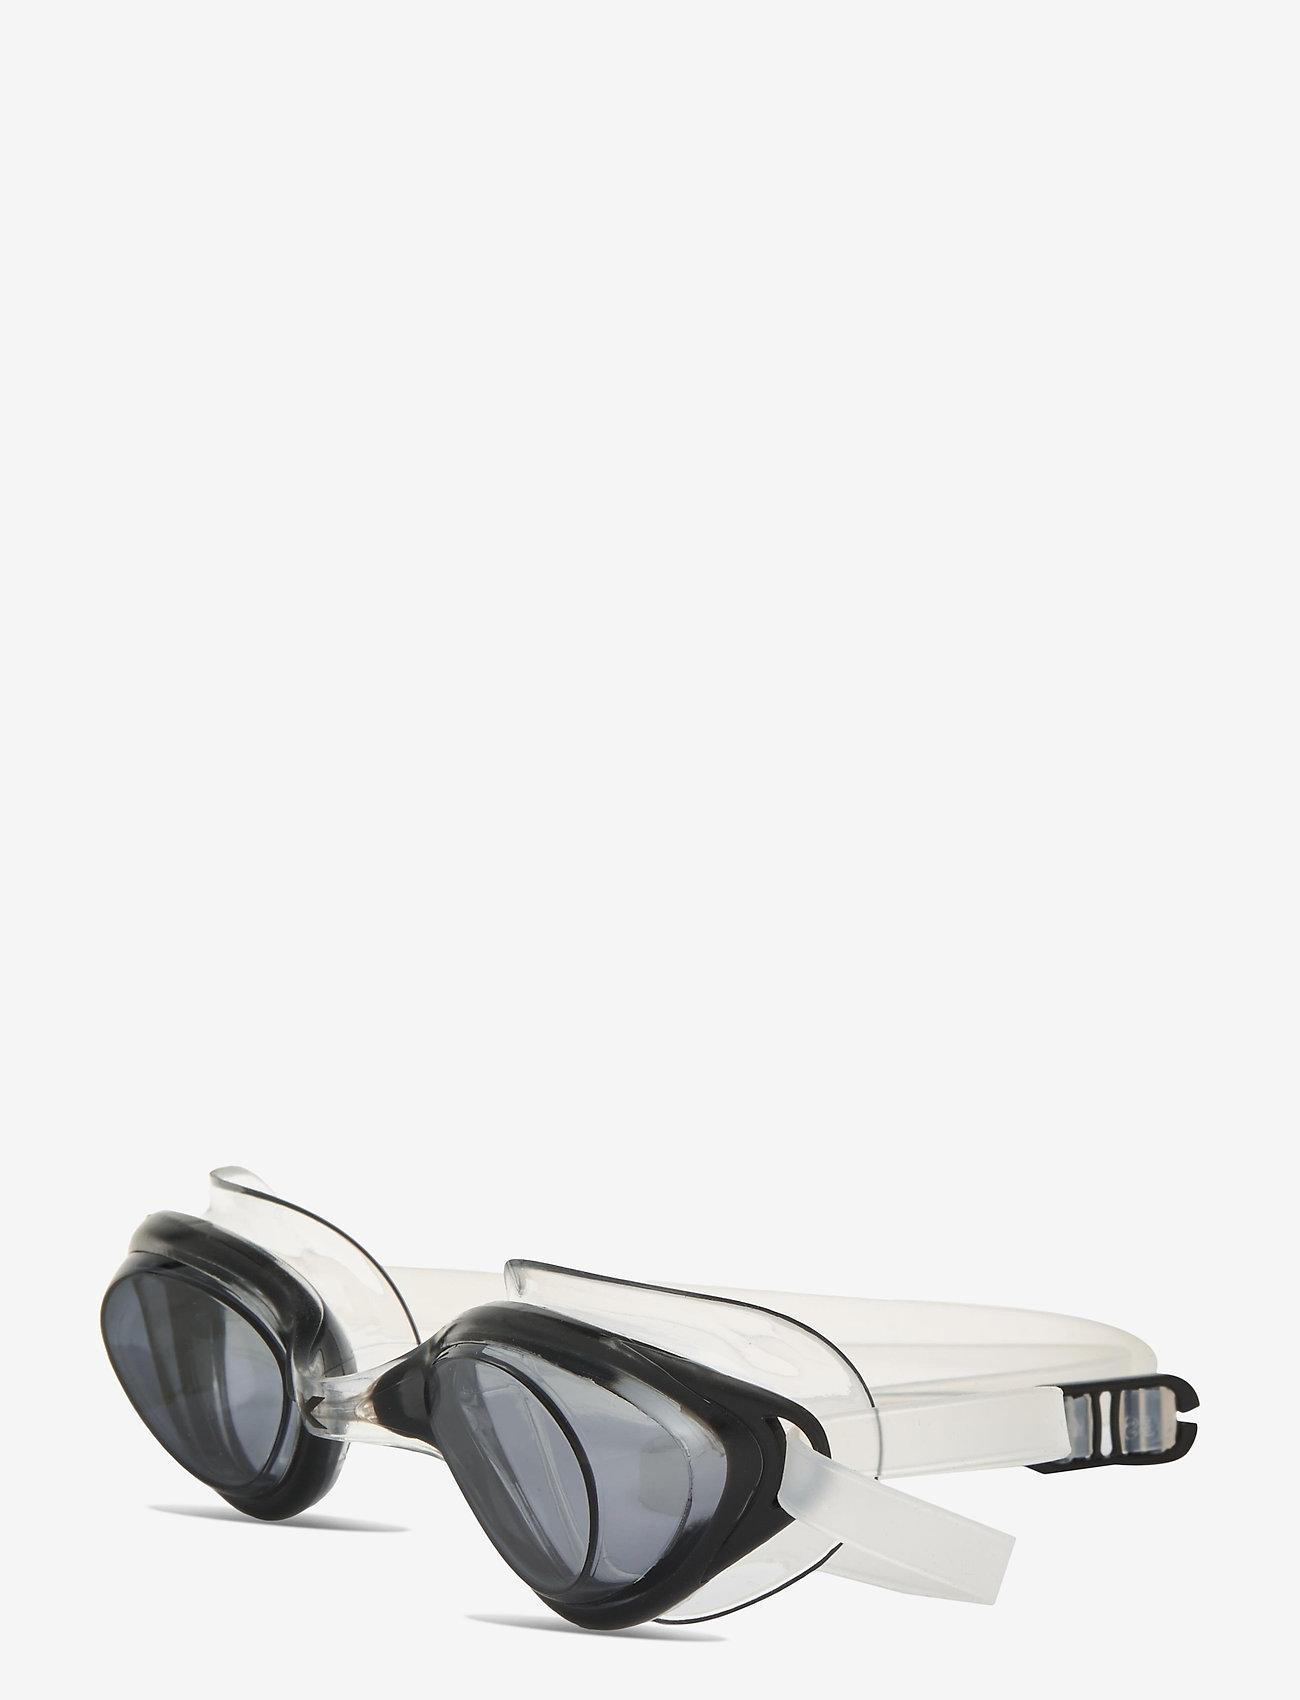 2XU - RIVAL GOGGLE - SMOKE - bril - black/clear - 1